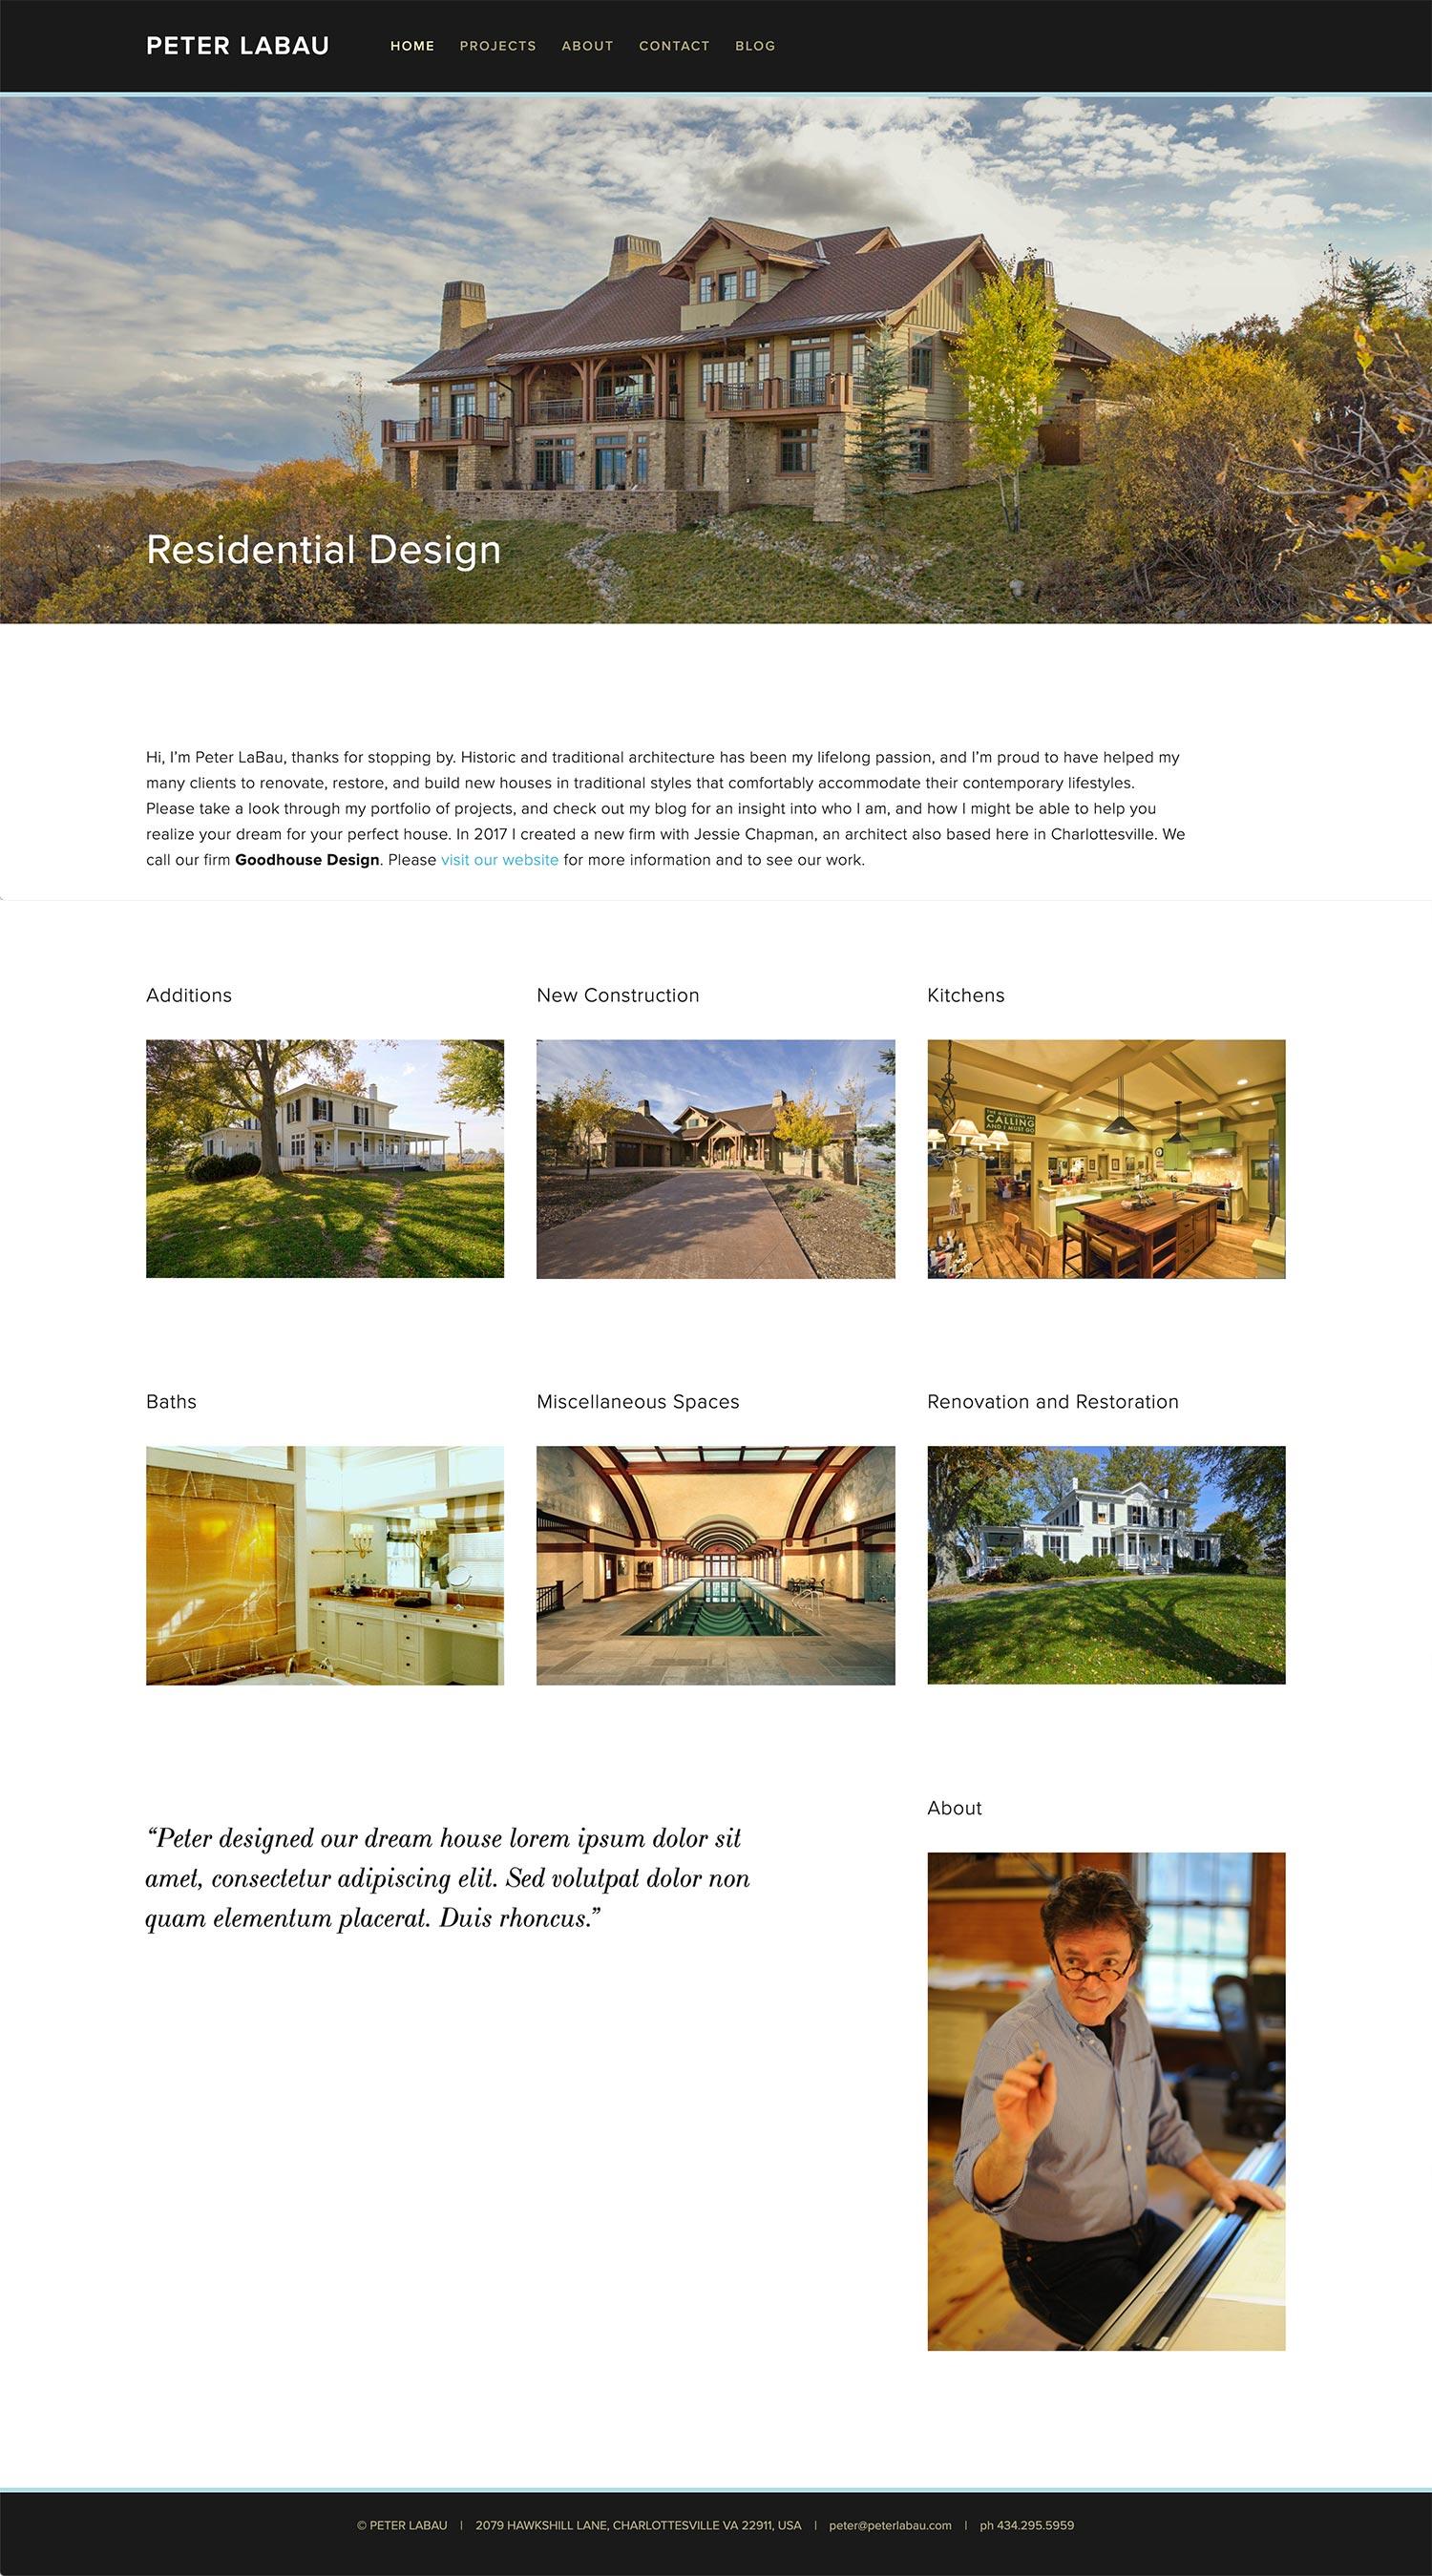 Peter LaBau website redesign